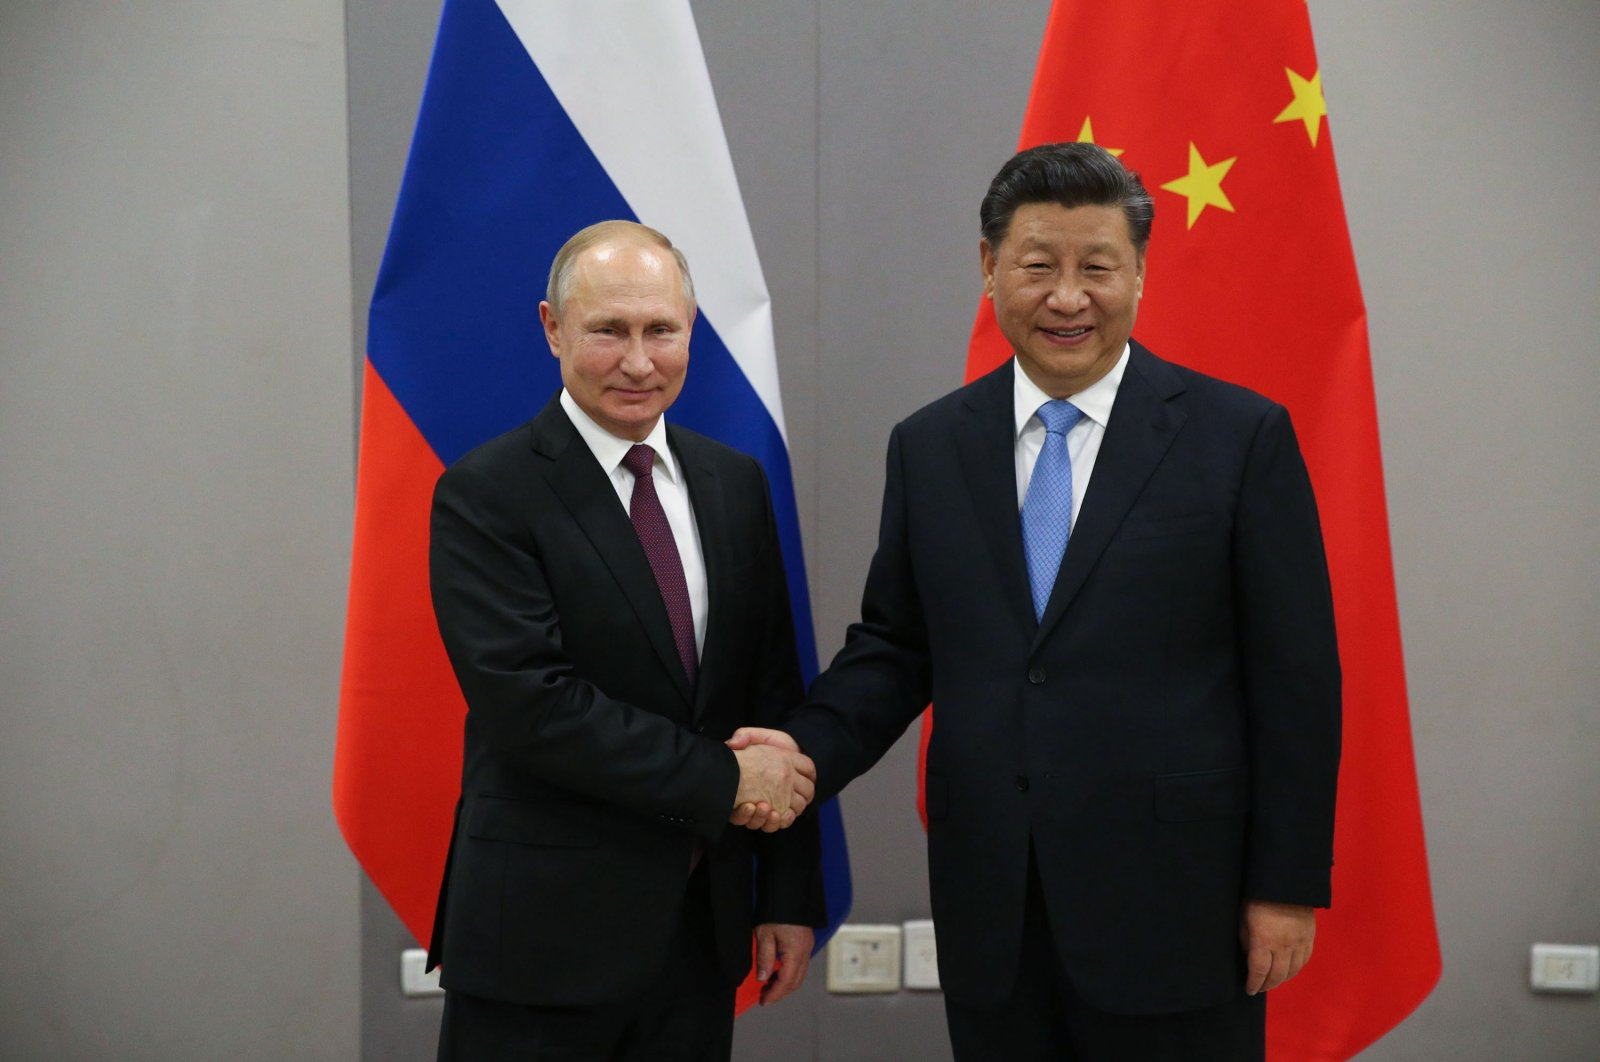 Russian President Vladimir Putin (L) greets Chinese President Xi Jinping (R) during their bilateral meeting, Nov. 13, 2019, in Brasilia, Brazil. (Getty Images)